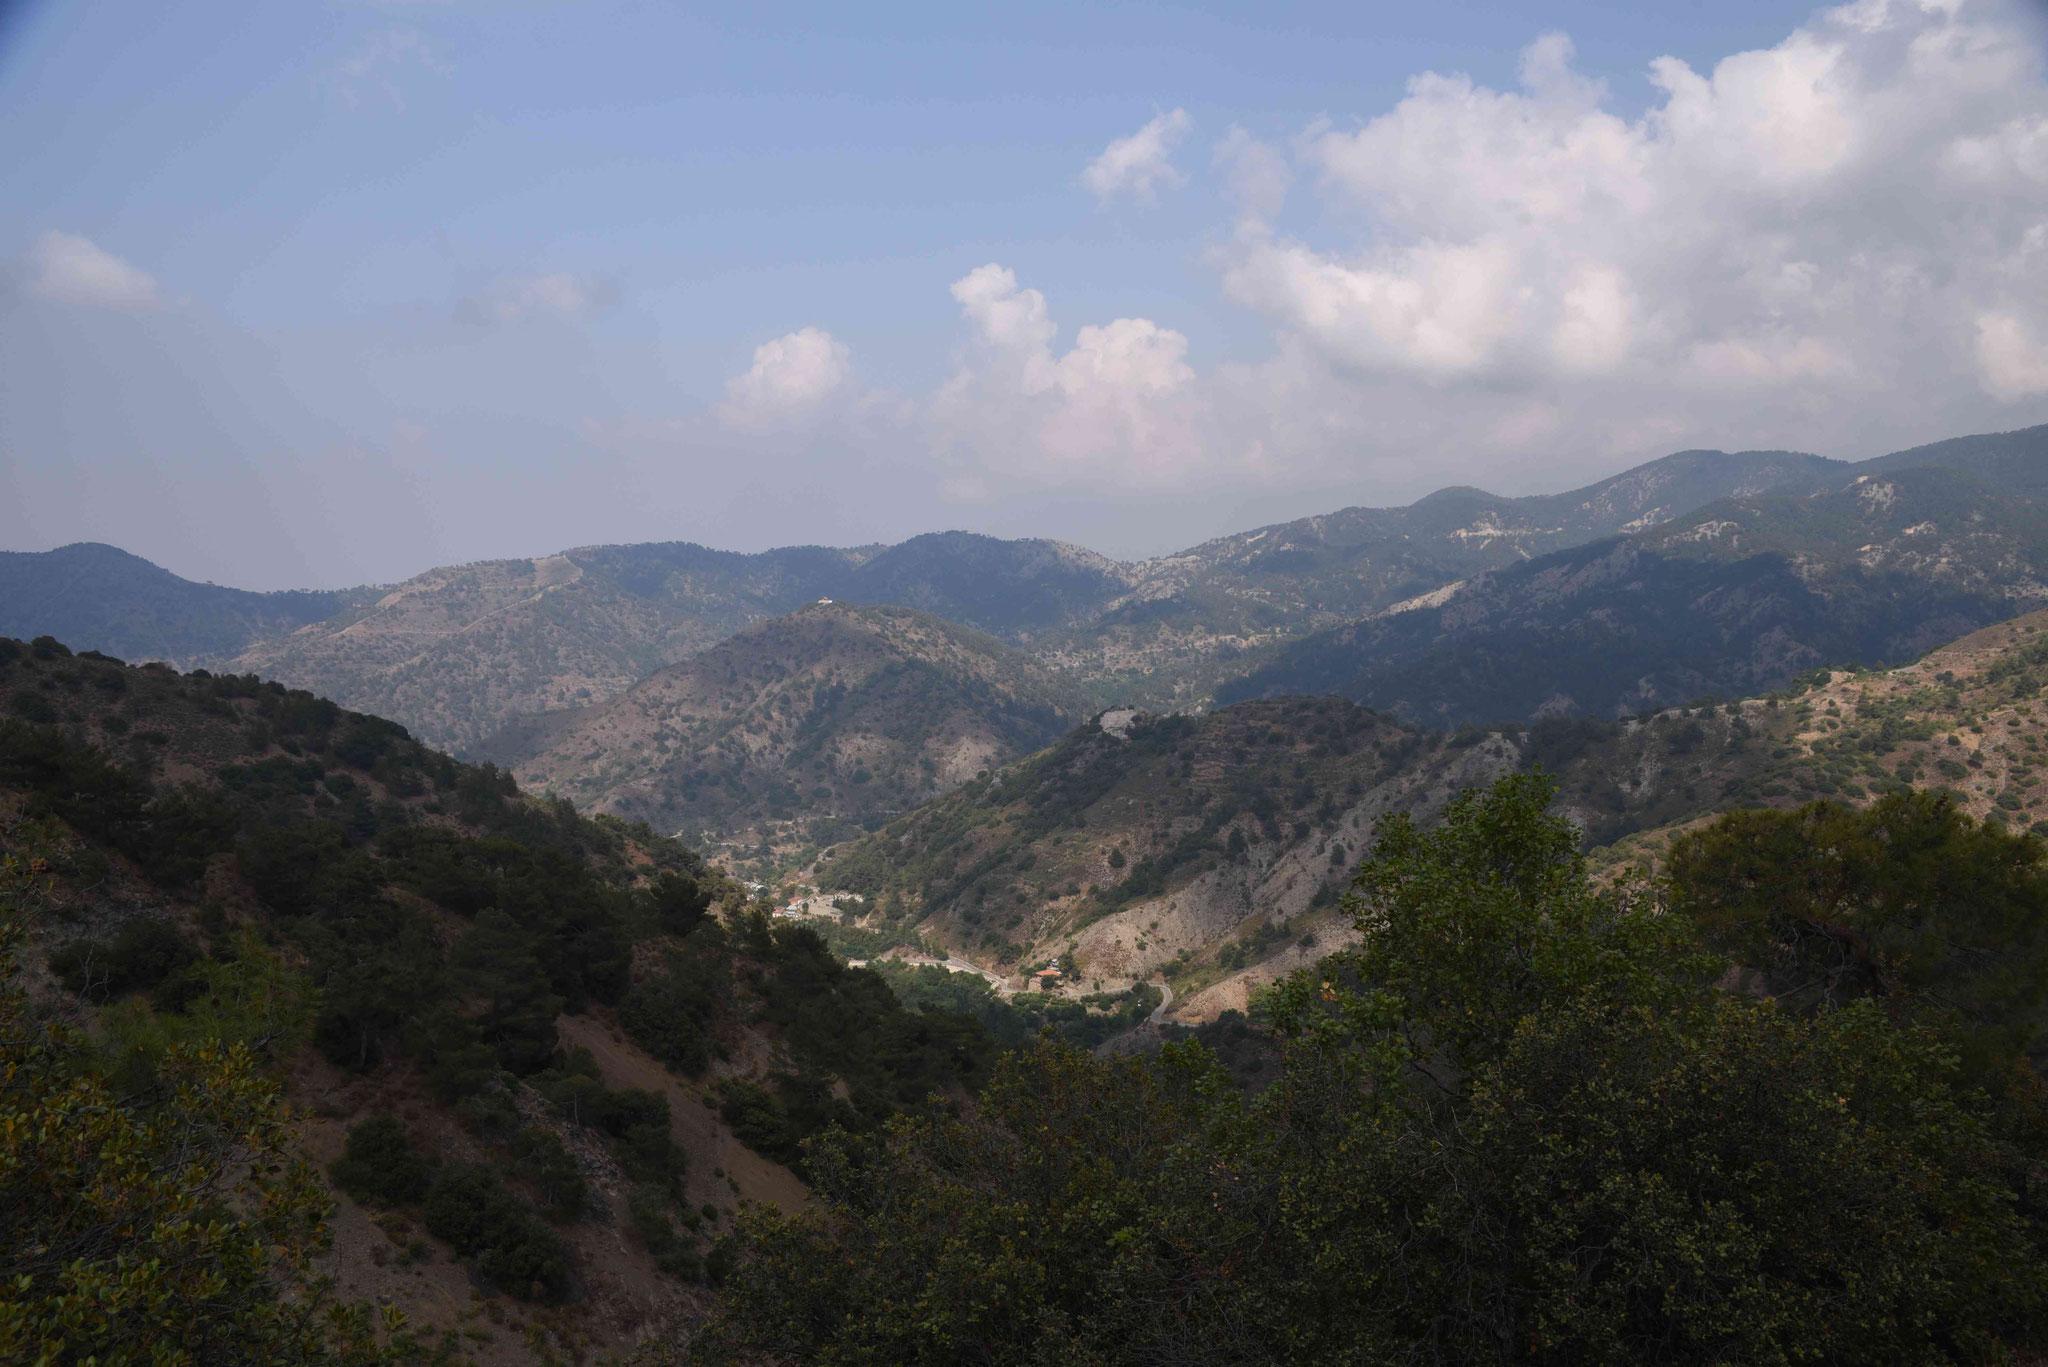 Blick über die Berge Zyperns I